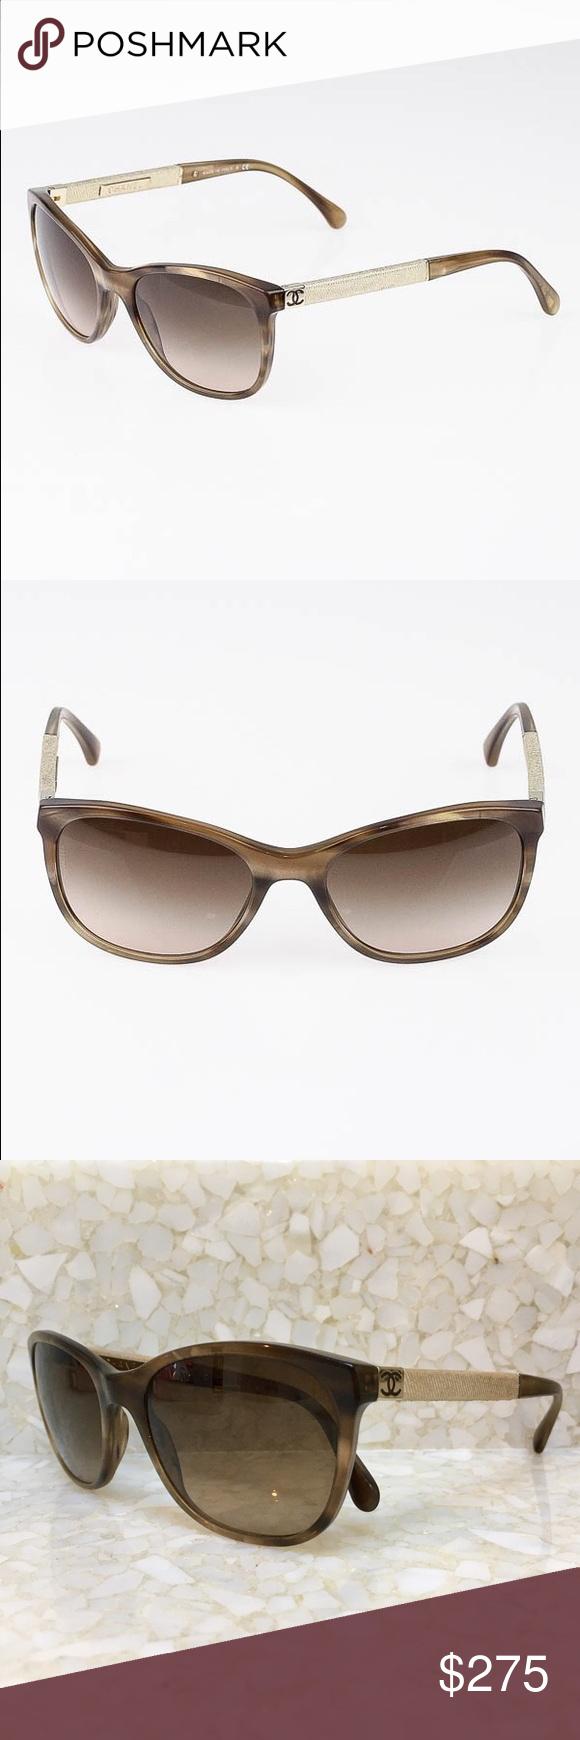 Authentic! CHANEL sunglasses Light Brown Tortoise Frame Denim ...